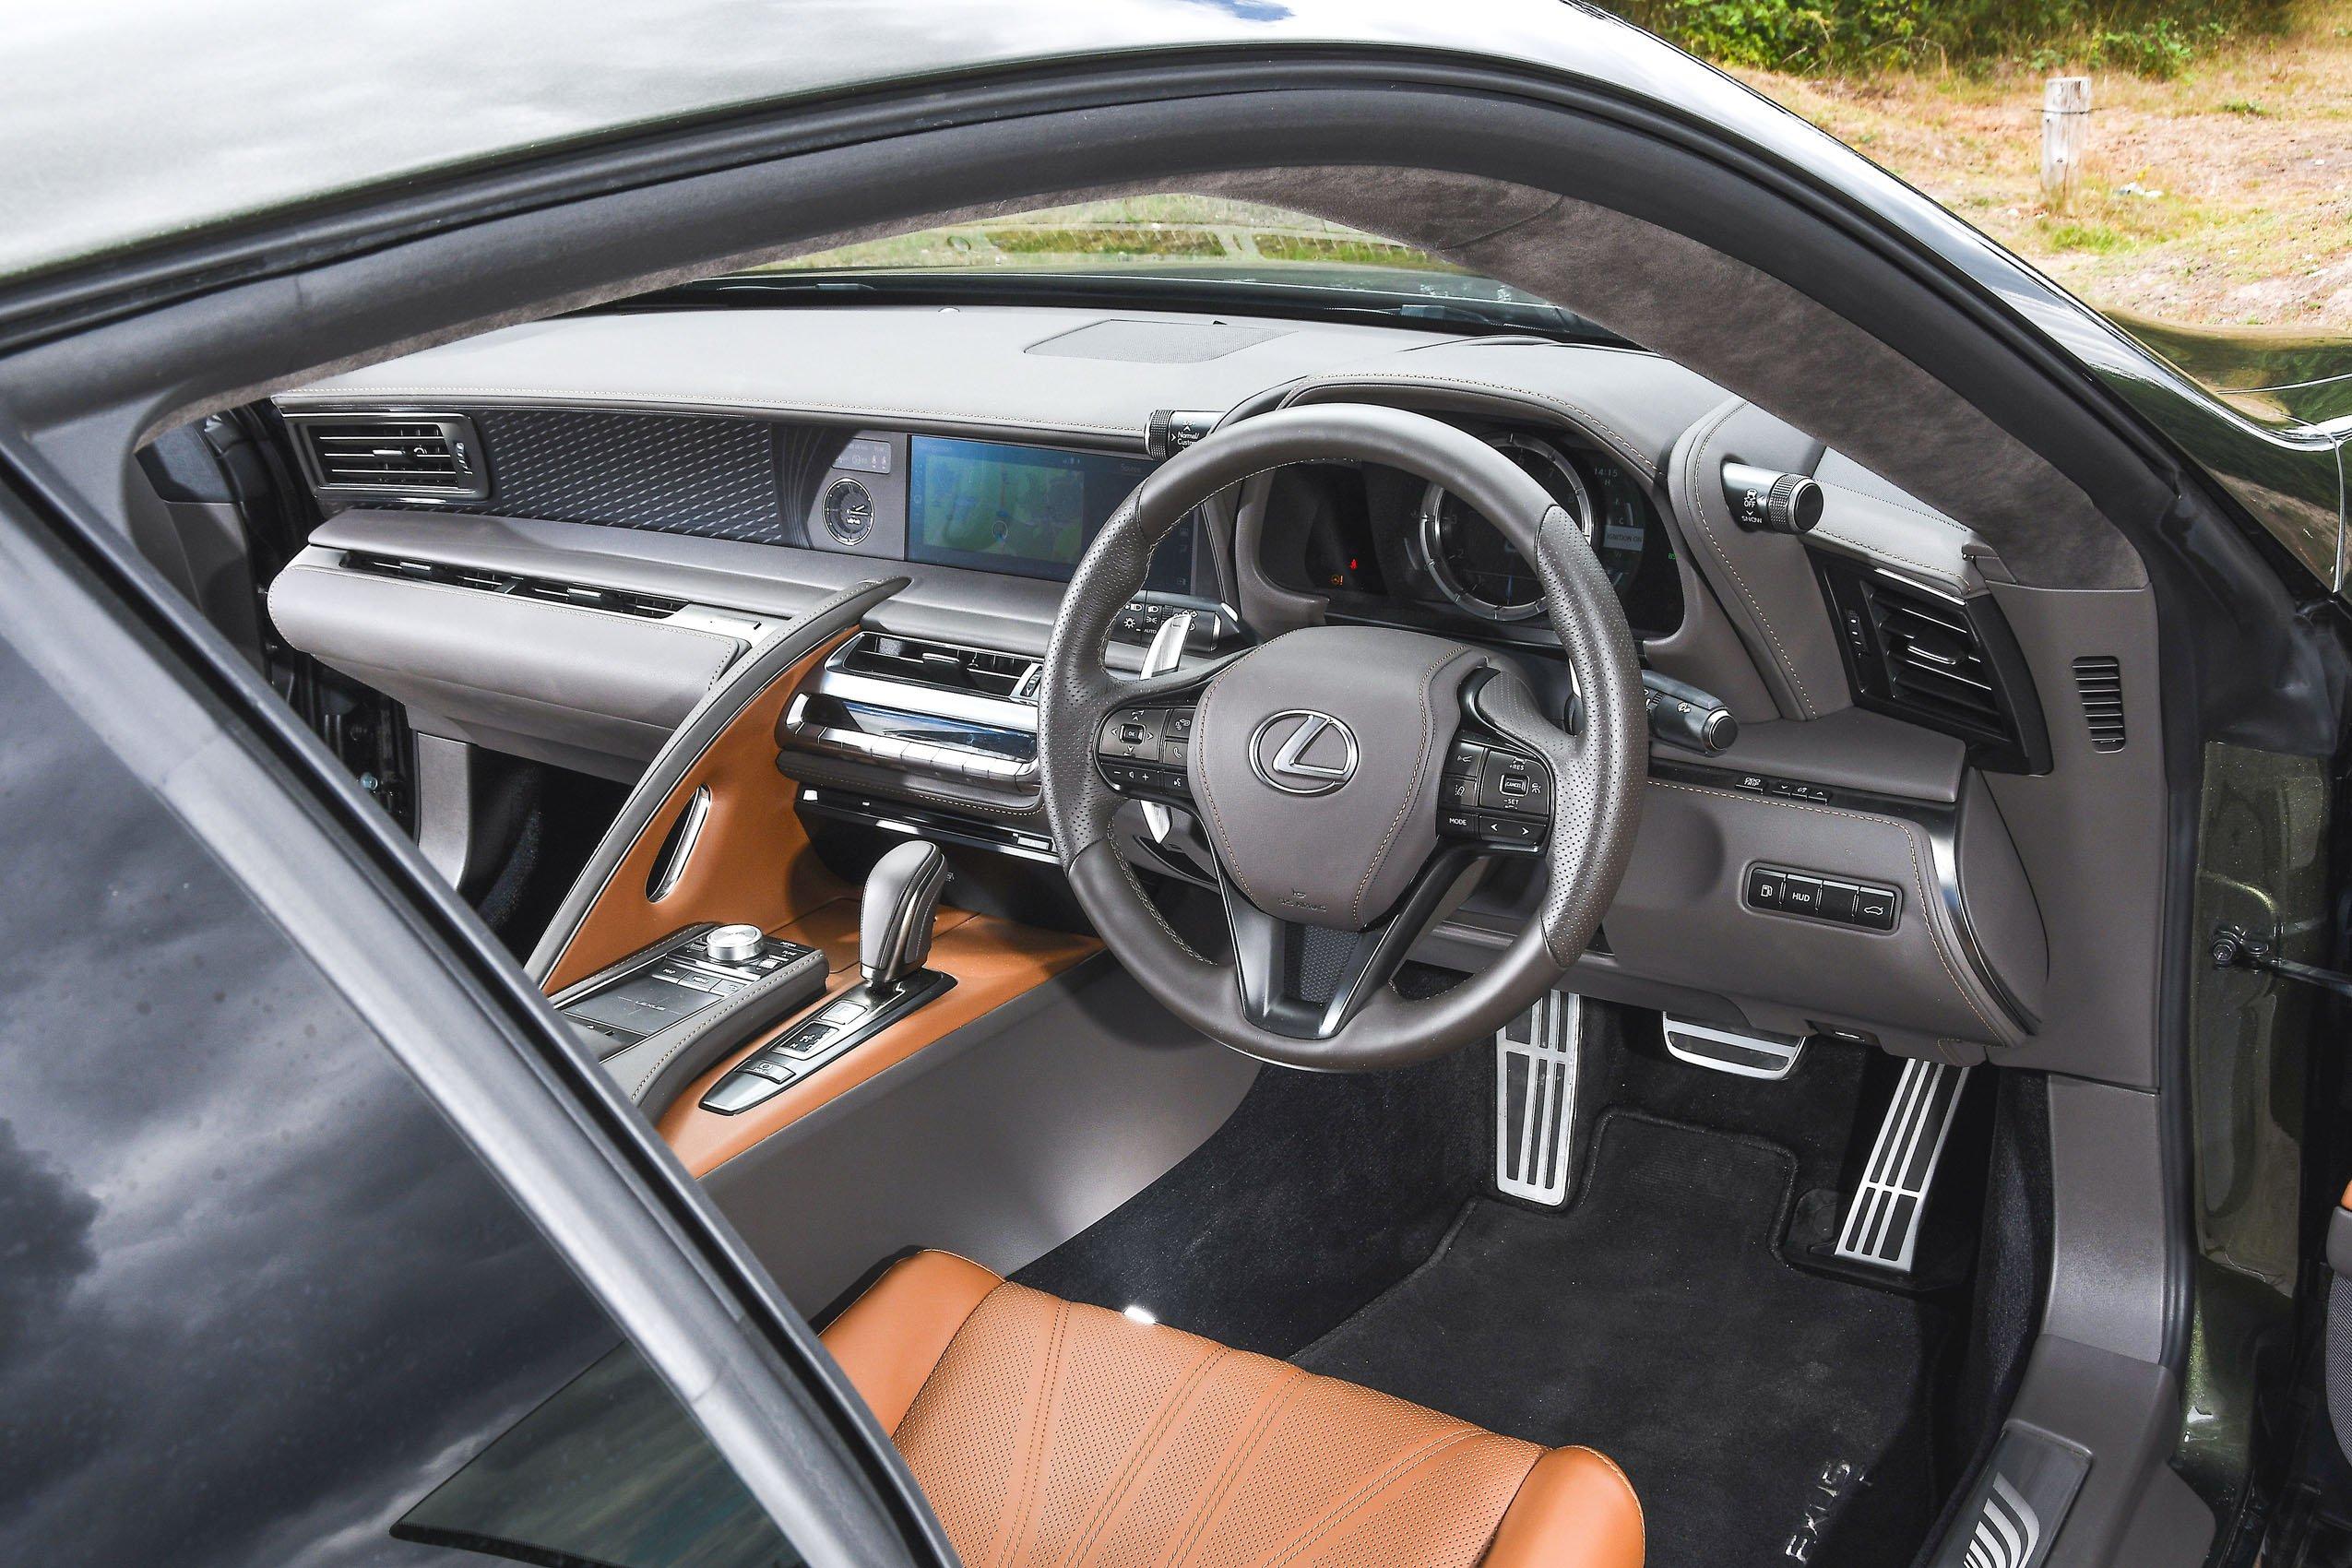 Lexus LC 500 2020 dashboard